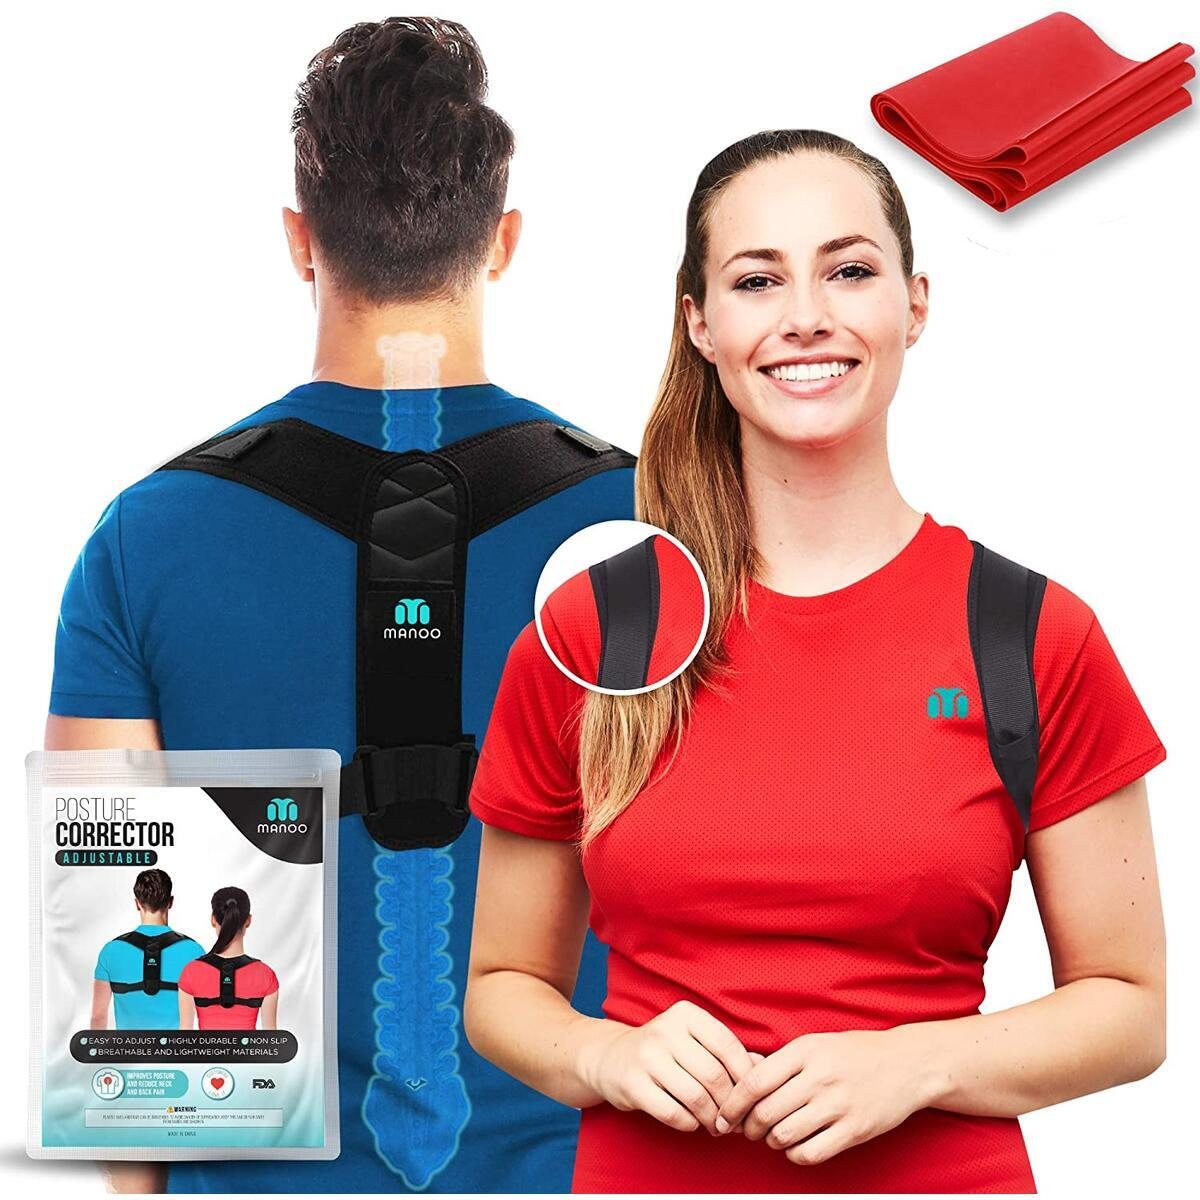 Posture Corrector for Men and Women - Upper Back Support Brace - Adjustable Back Straightener - Discreet Under Clothes